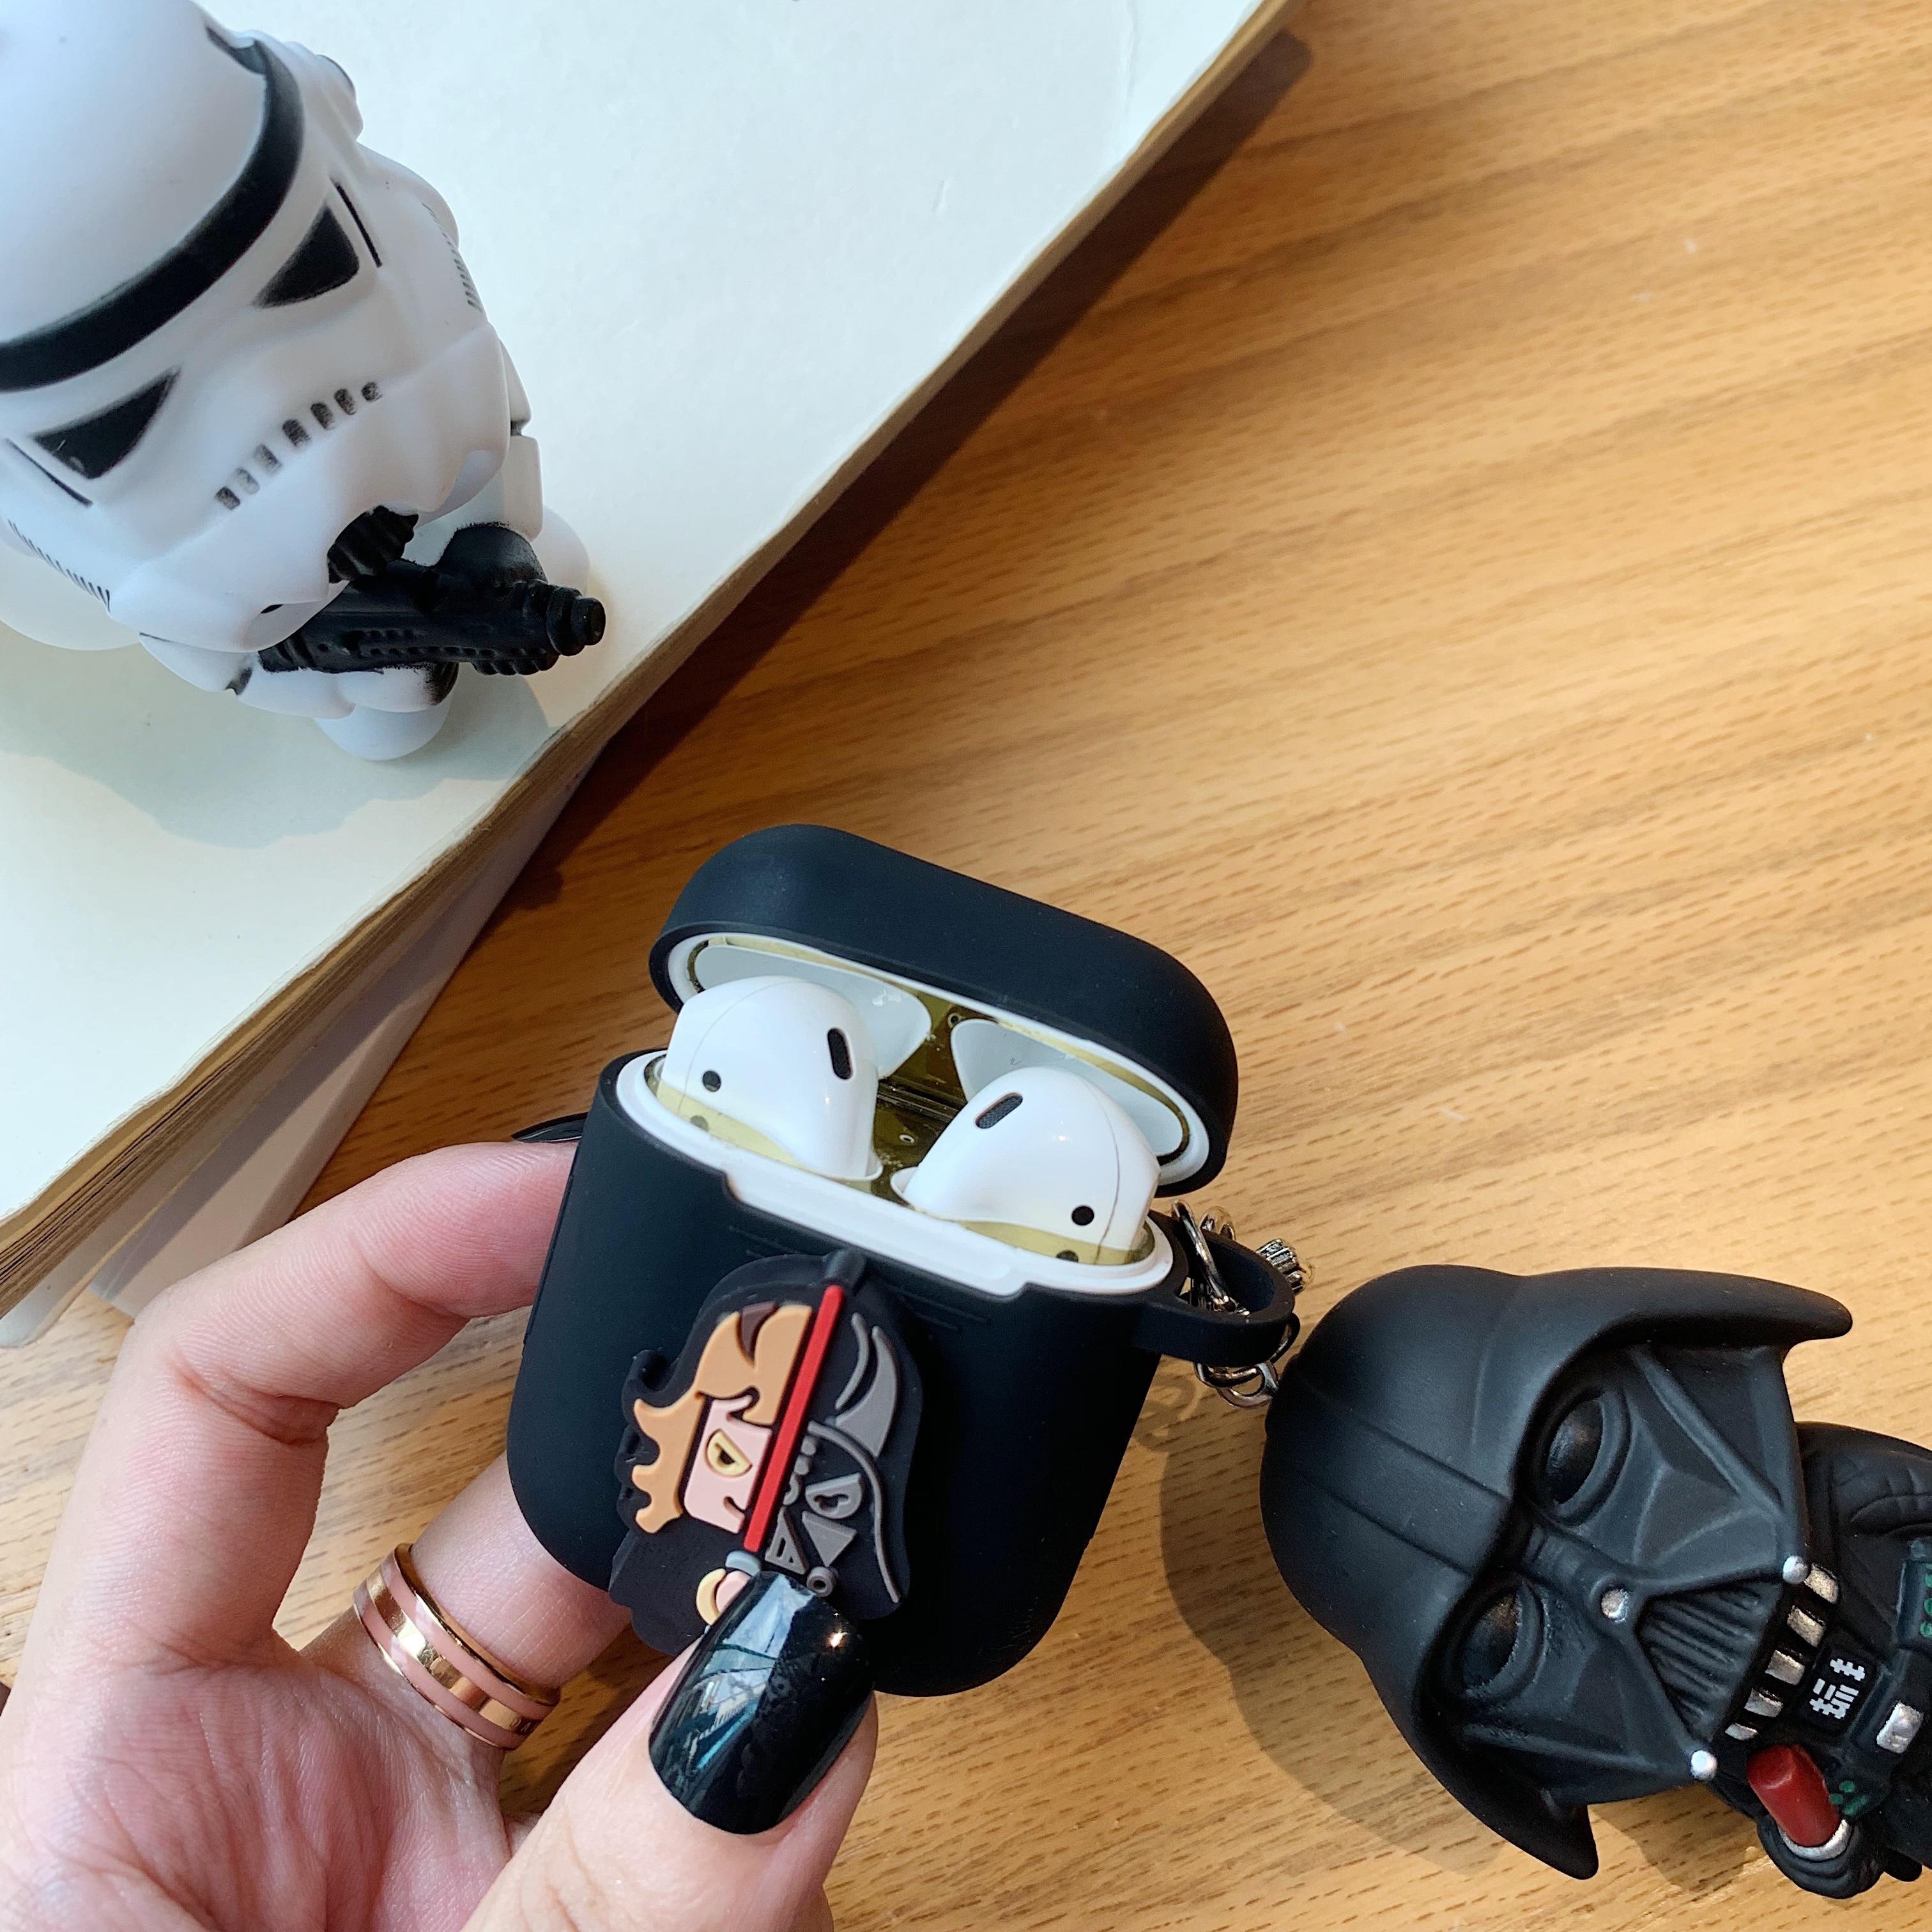 Star Wars AirPod Case 4